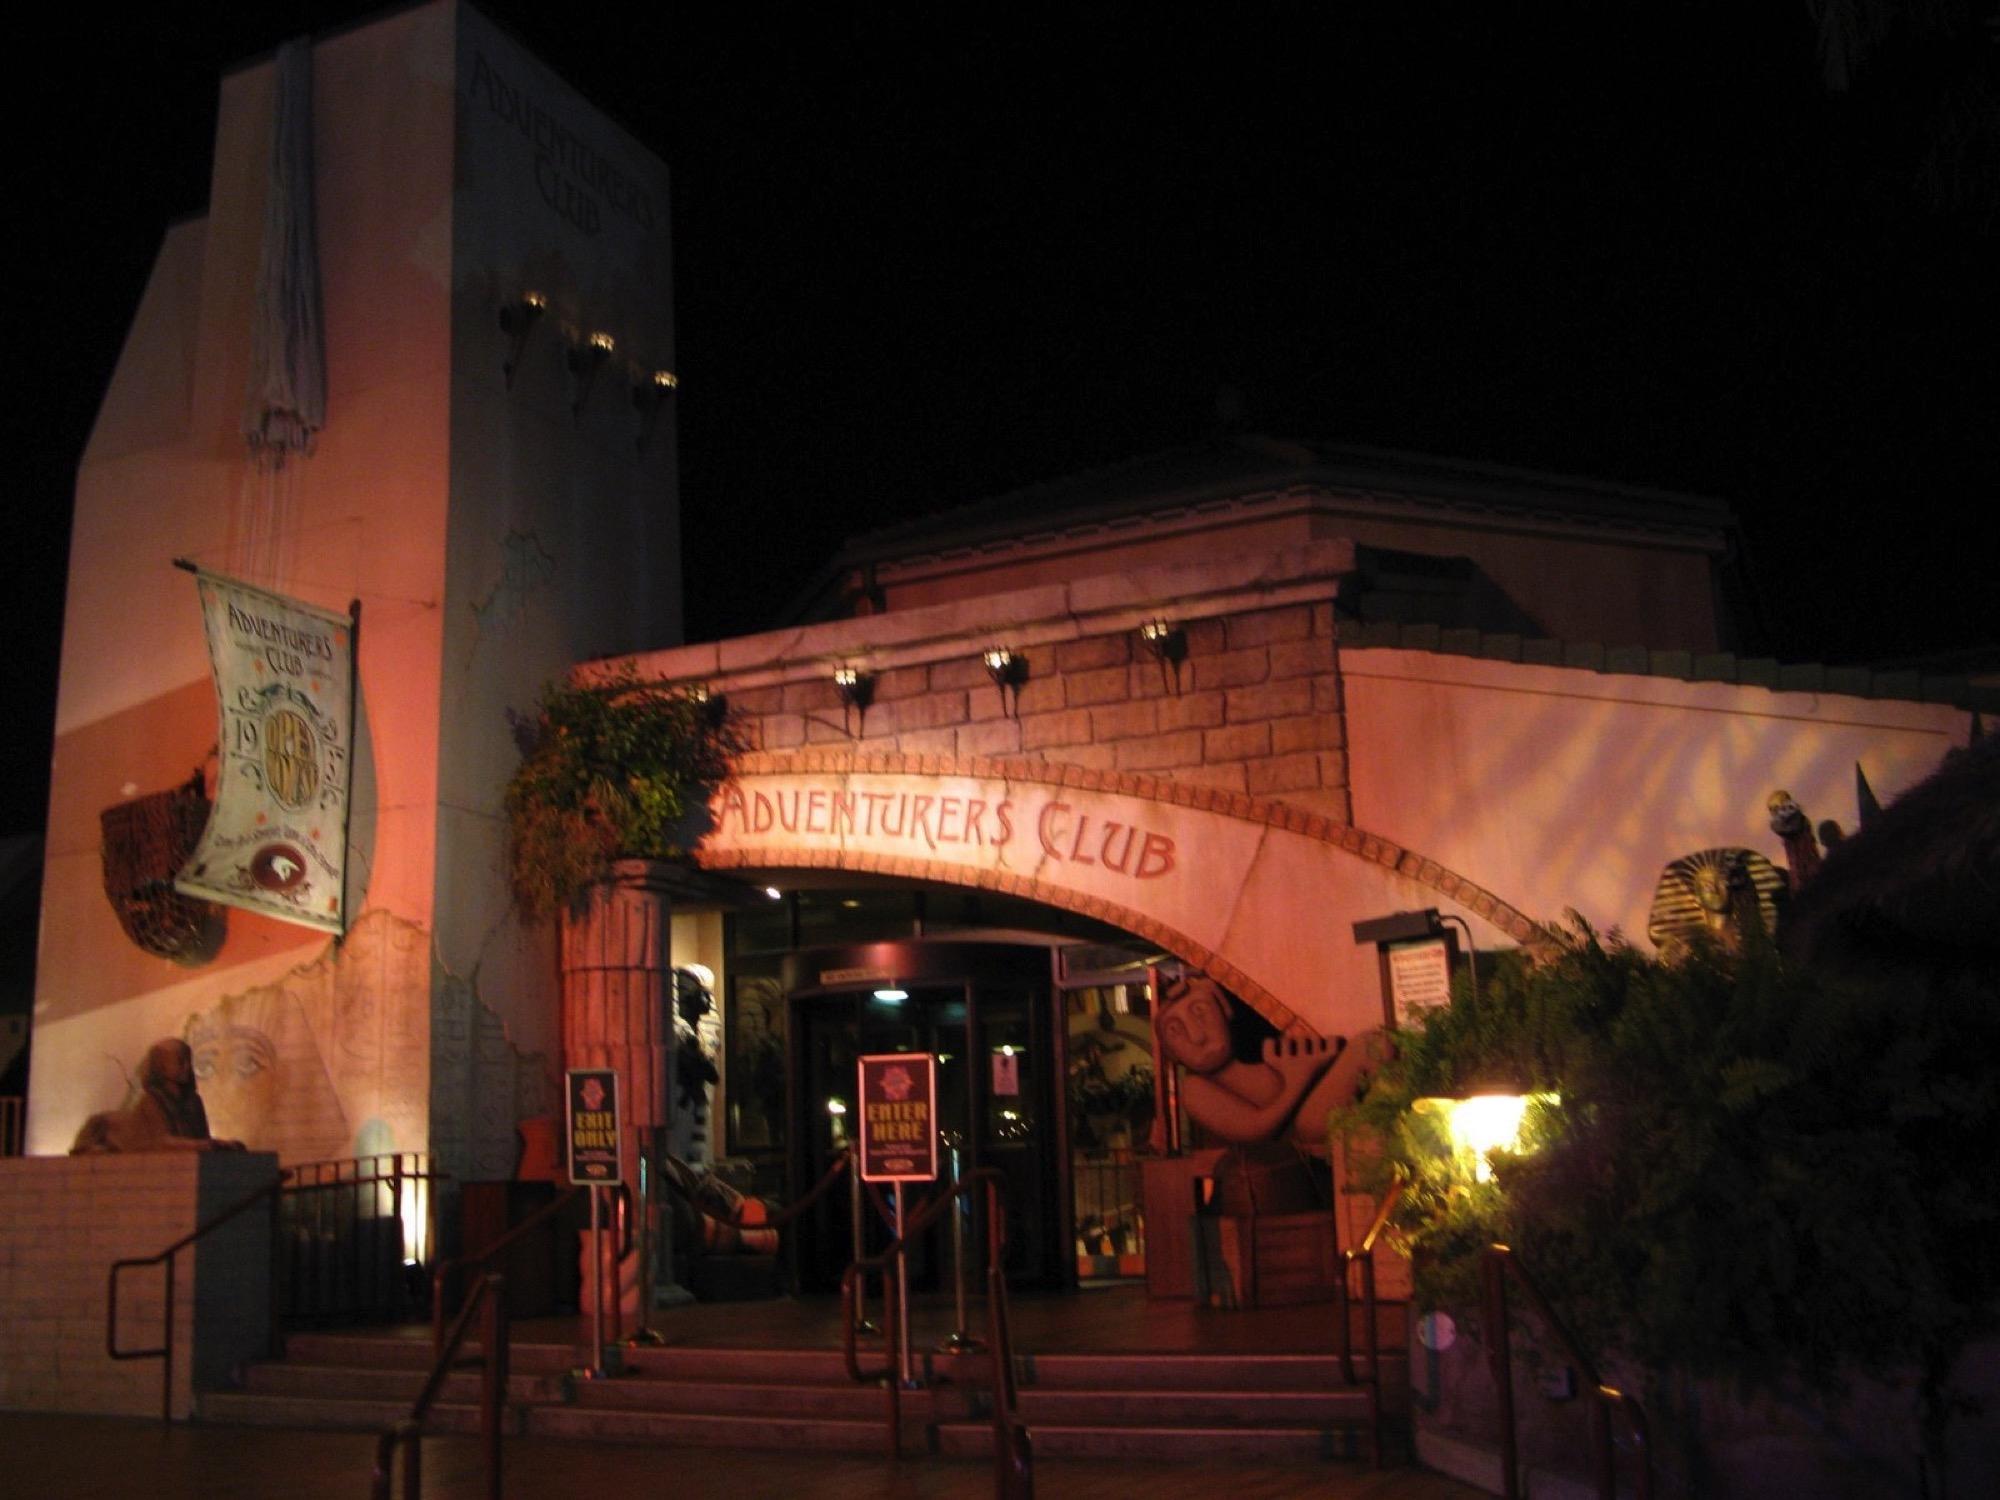 Adventurers Club, Disney Springs, Walt Disney World